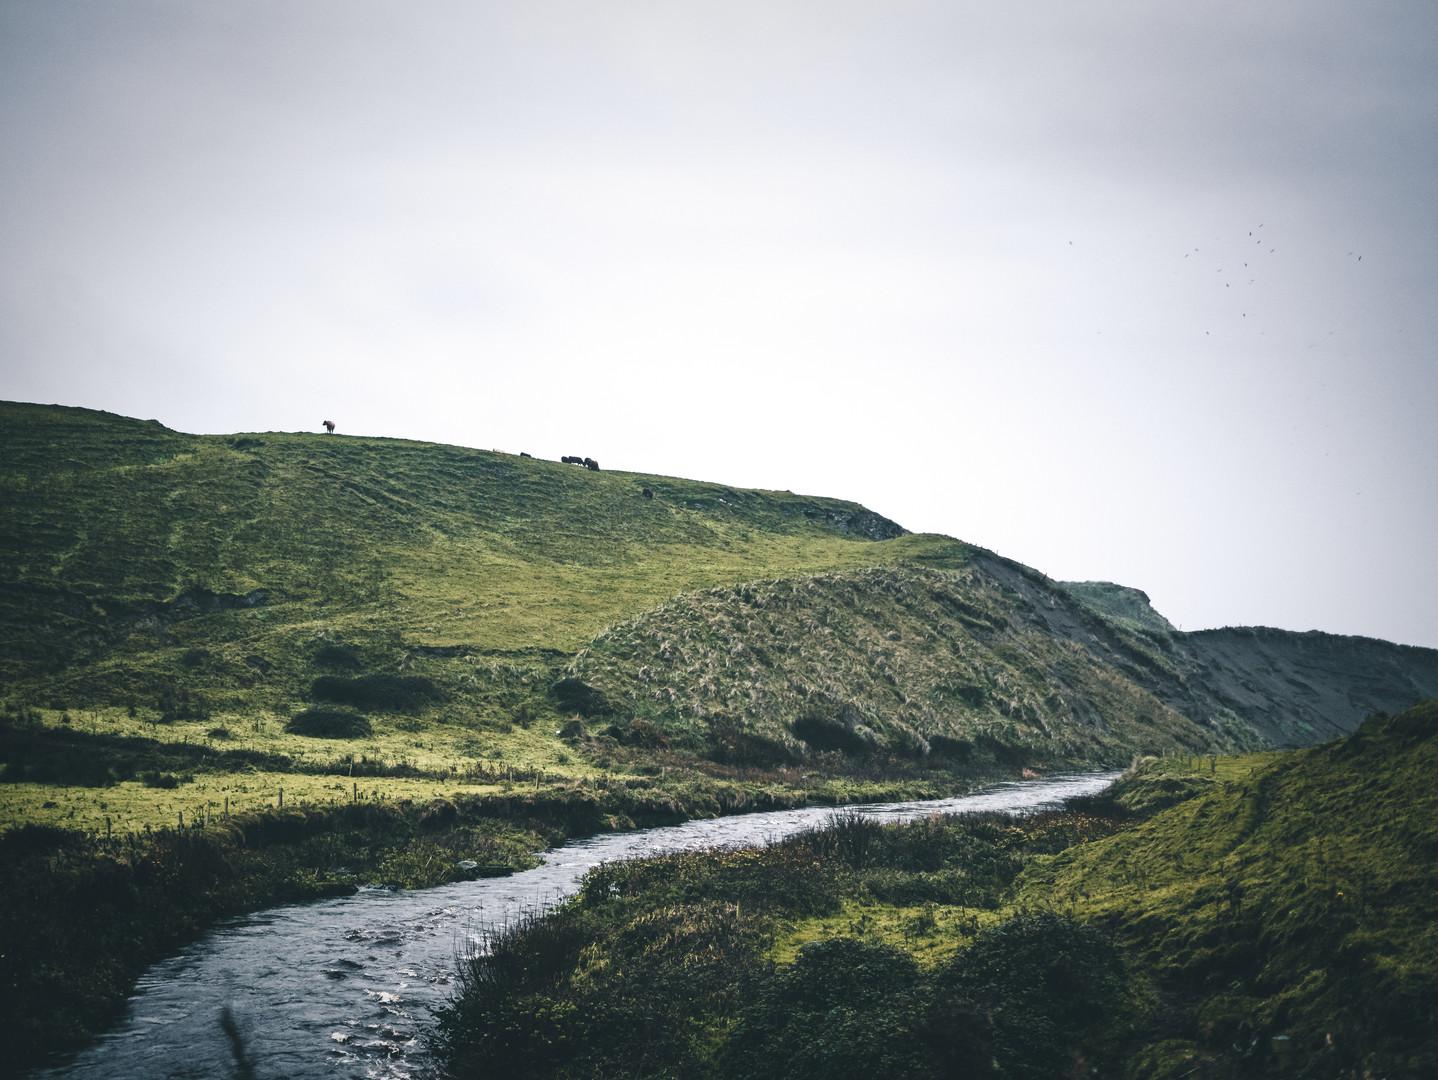 Green Hills under Grey Sky